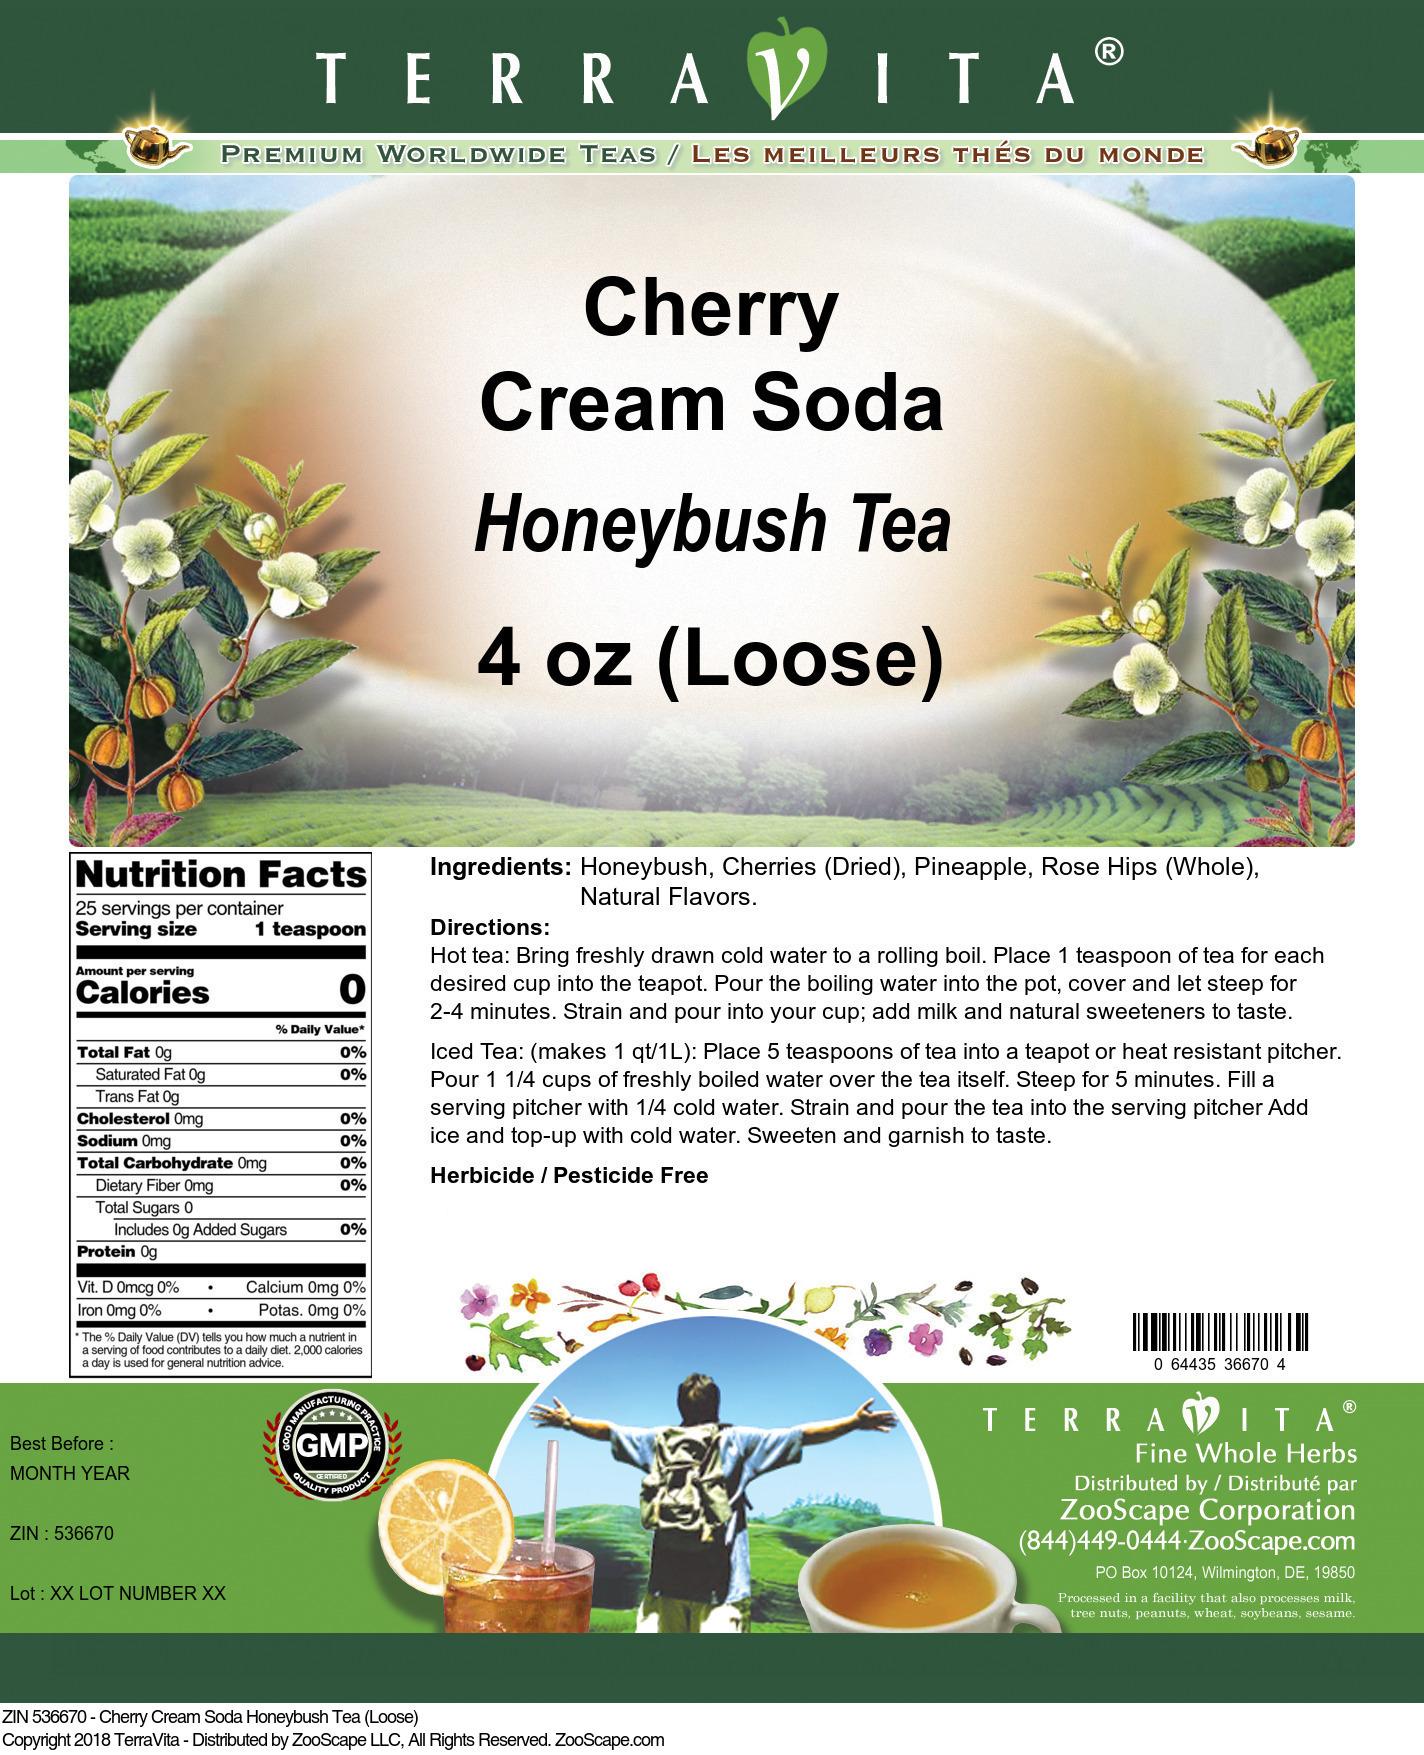 Cherry Cream Soda Honeybush Tea (Loose)